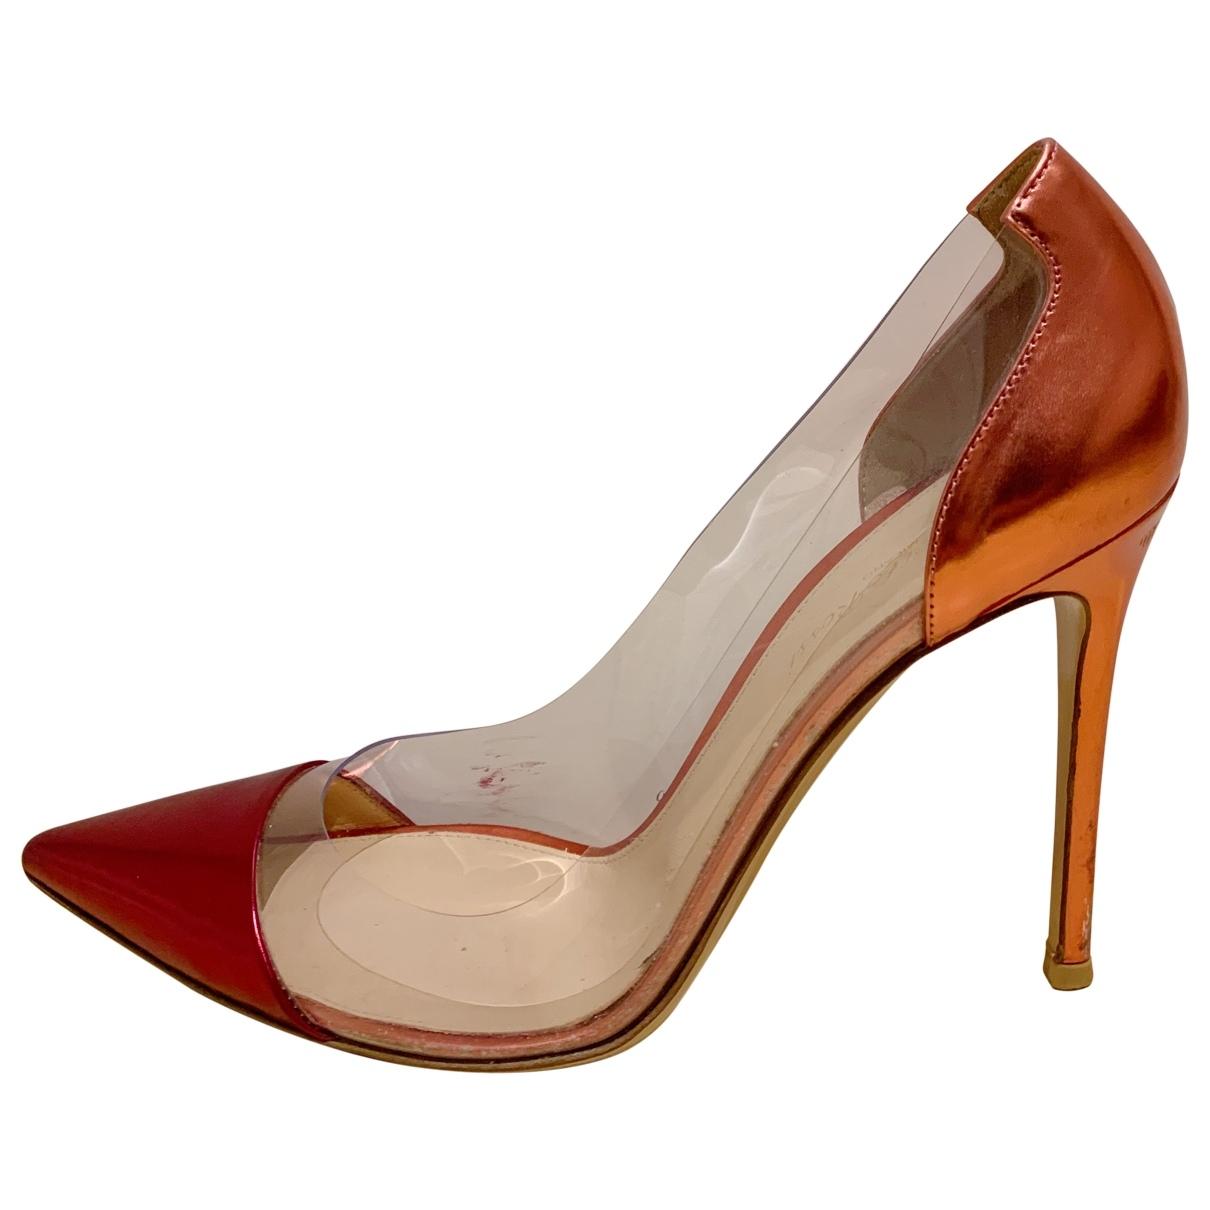 Gianvito Rossi Plexi Red Leather Heels for Women 40.5 EU